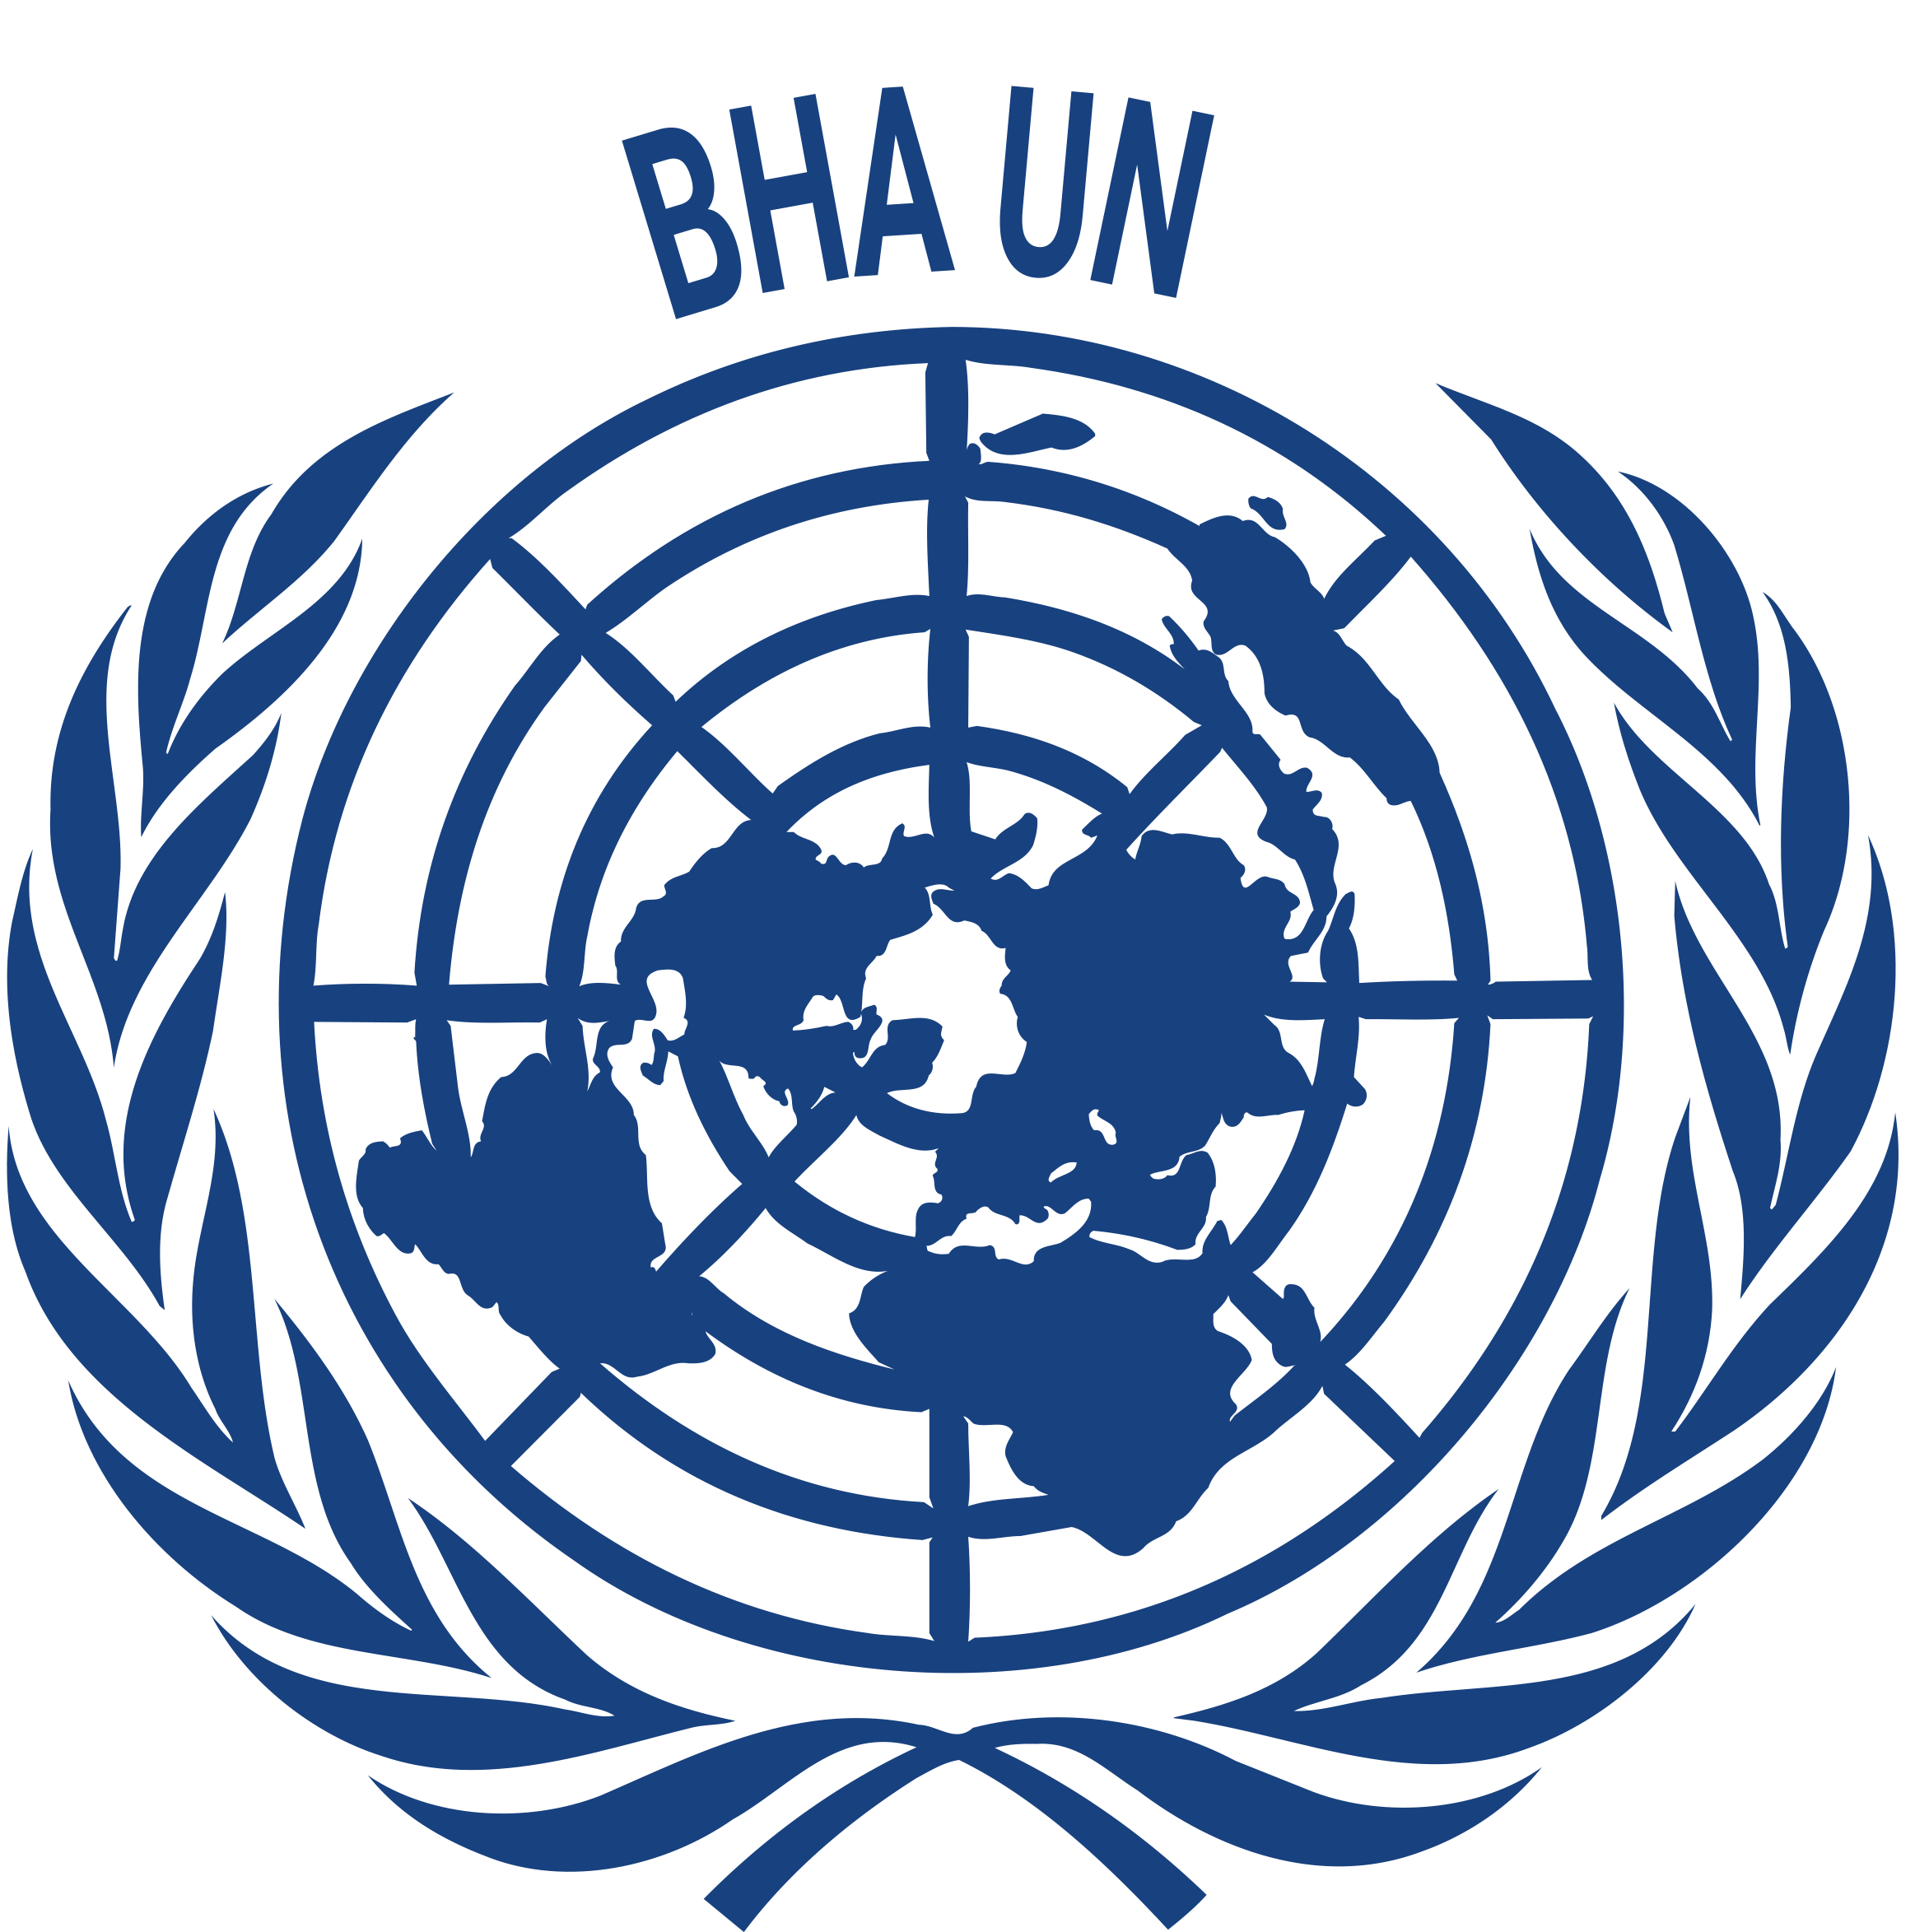 BHA UN logo